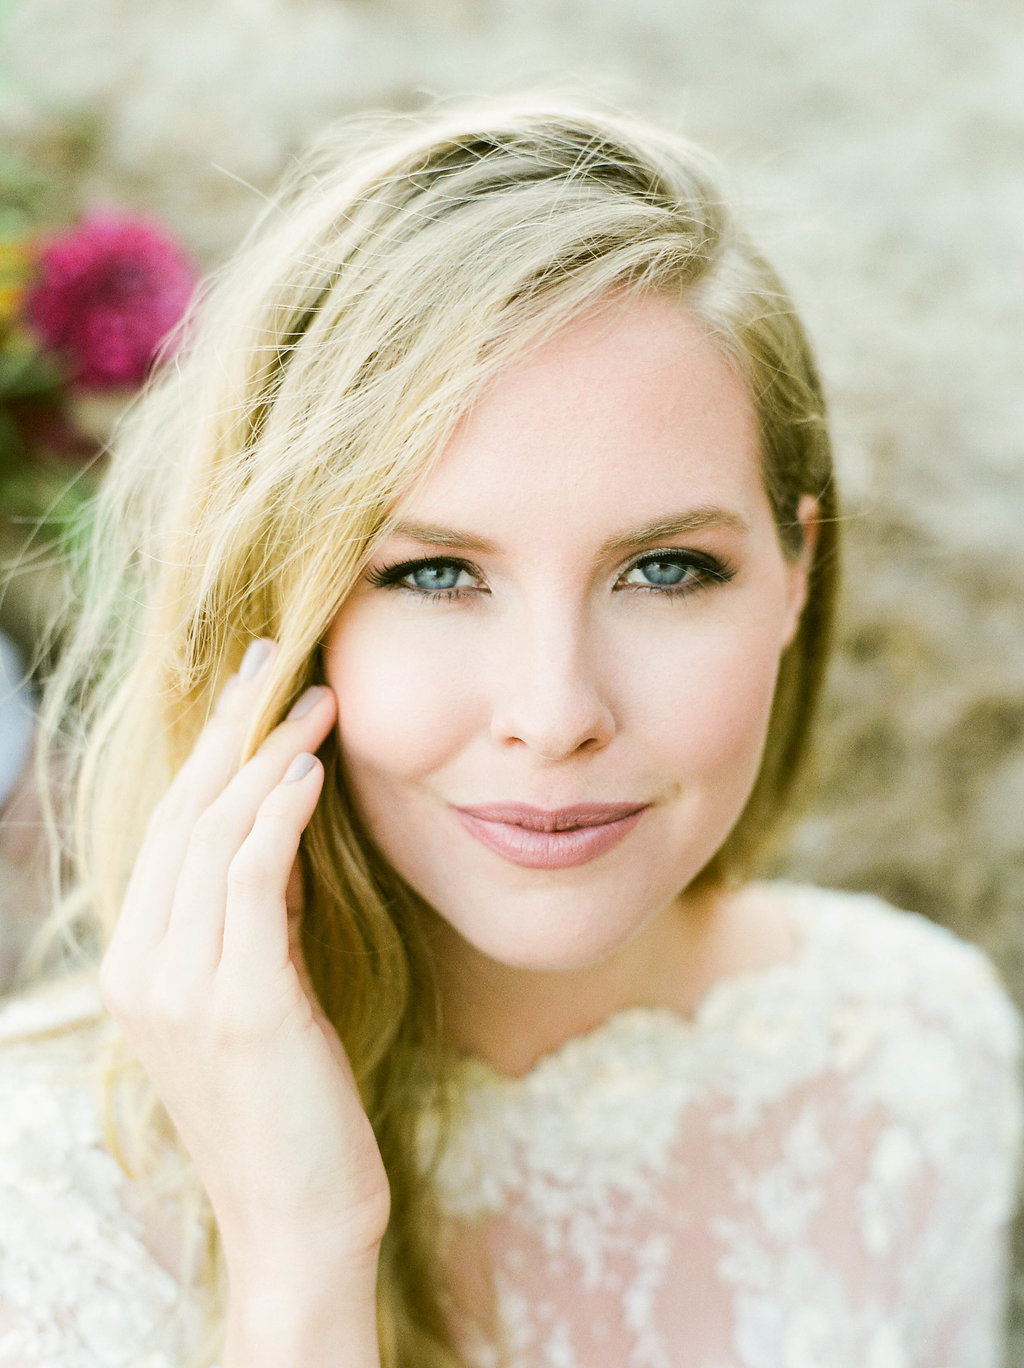 Malibu Coast Bridal Session | Marsais Photographie | California Wedding | California Photographer | Fine Art Wedding Blog | Canadian Wedding Blog | Joy Wed